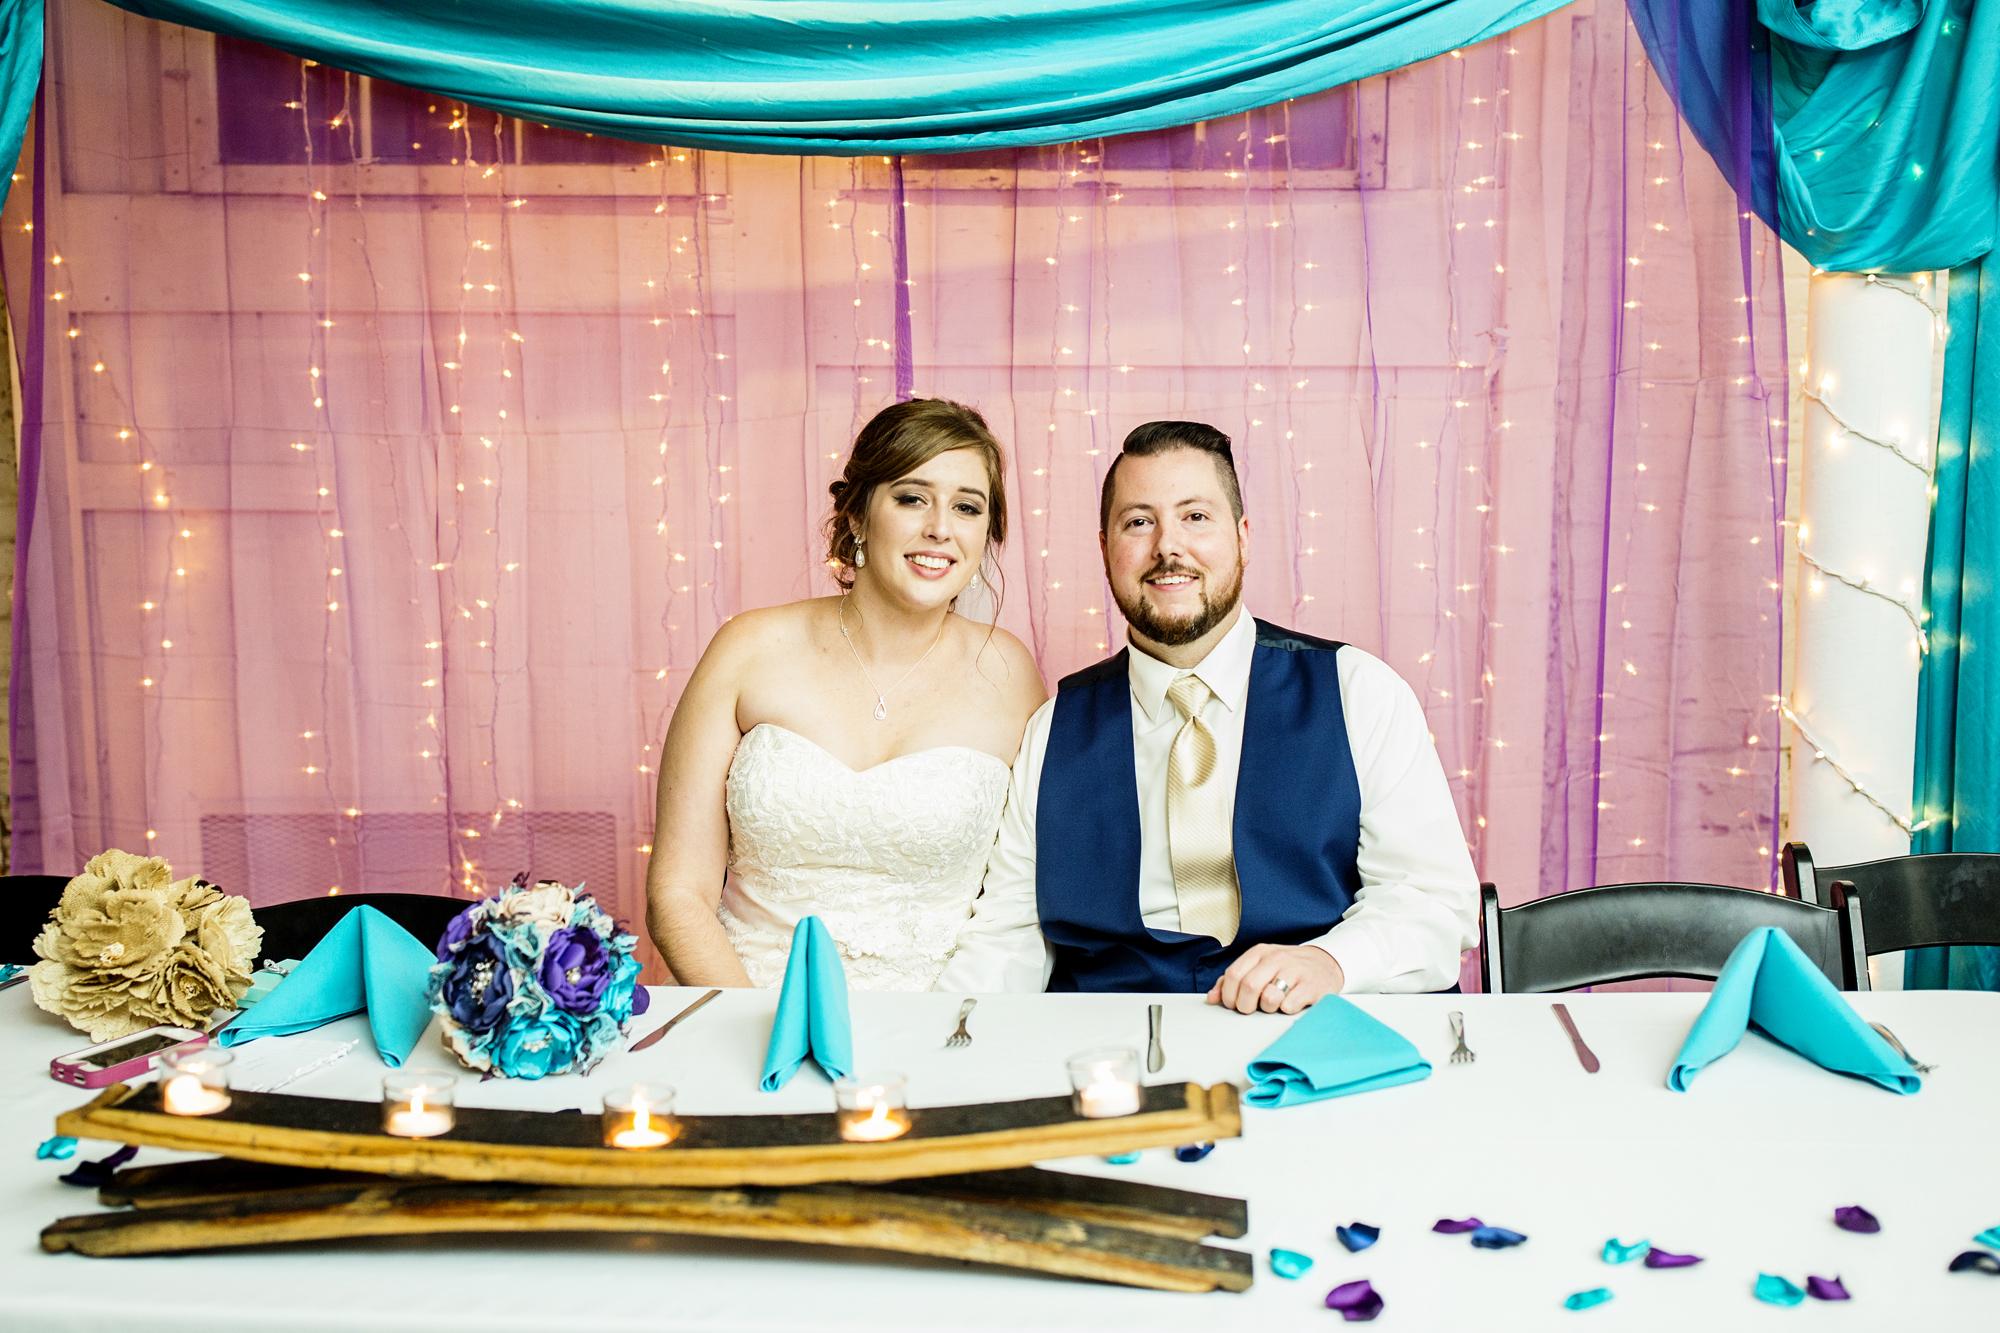 Seriously_Sabrina_Photography_Lexington_Kentucky_21c_Round_Barn_Red_Mile_Wedding_Gorley_96.jpg